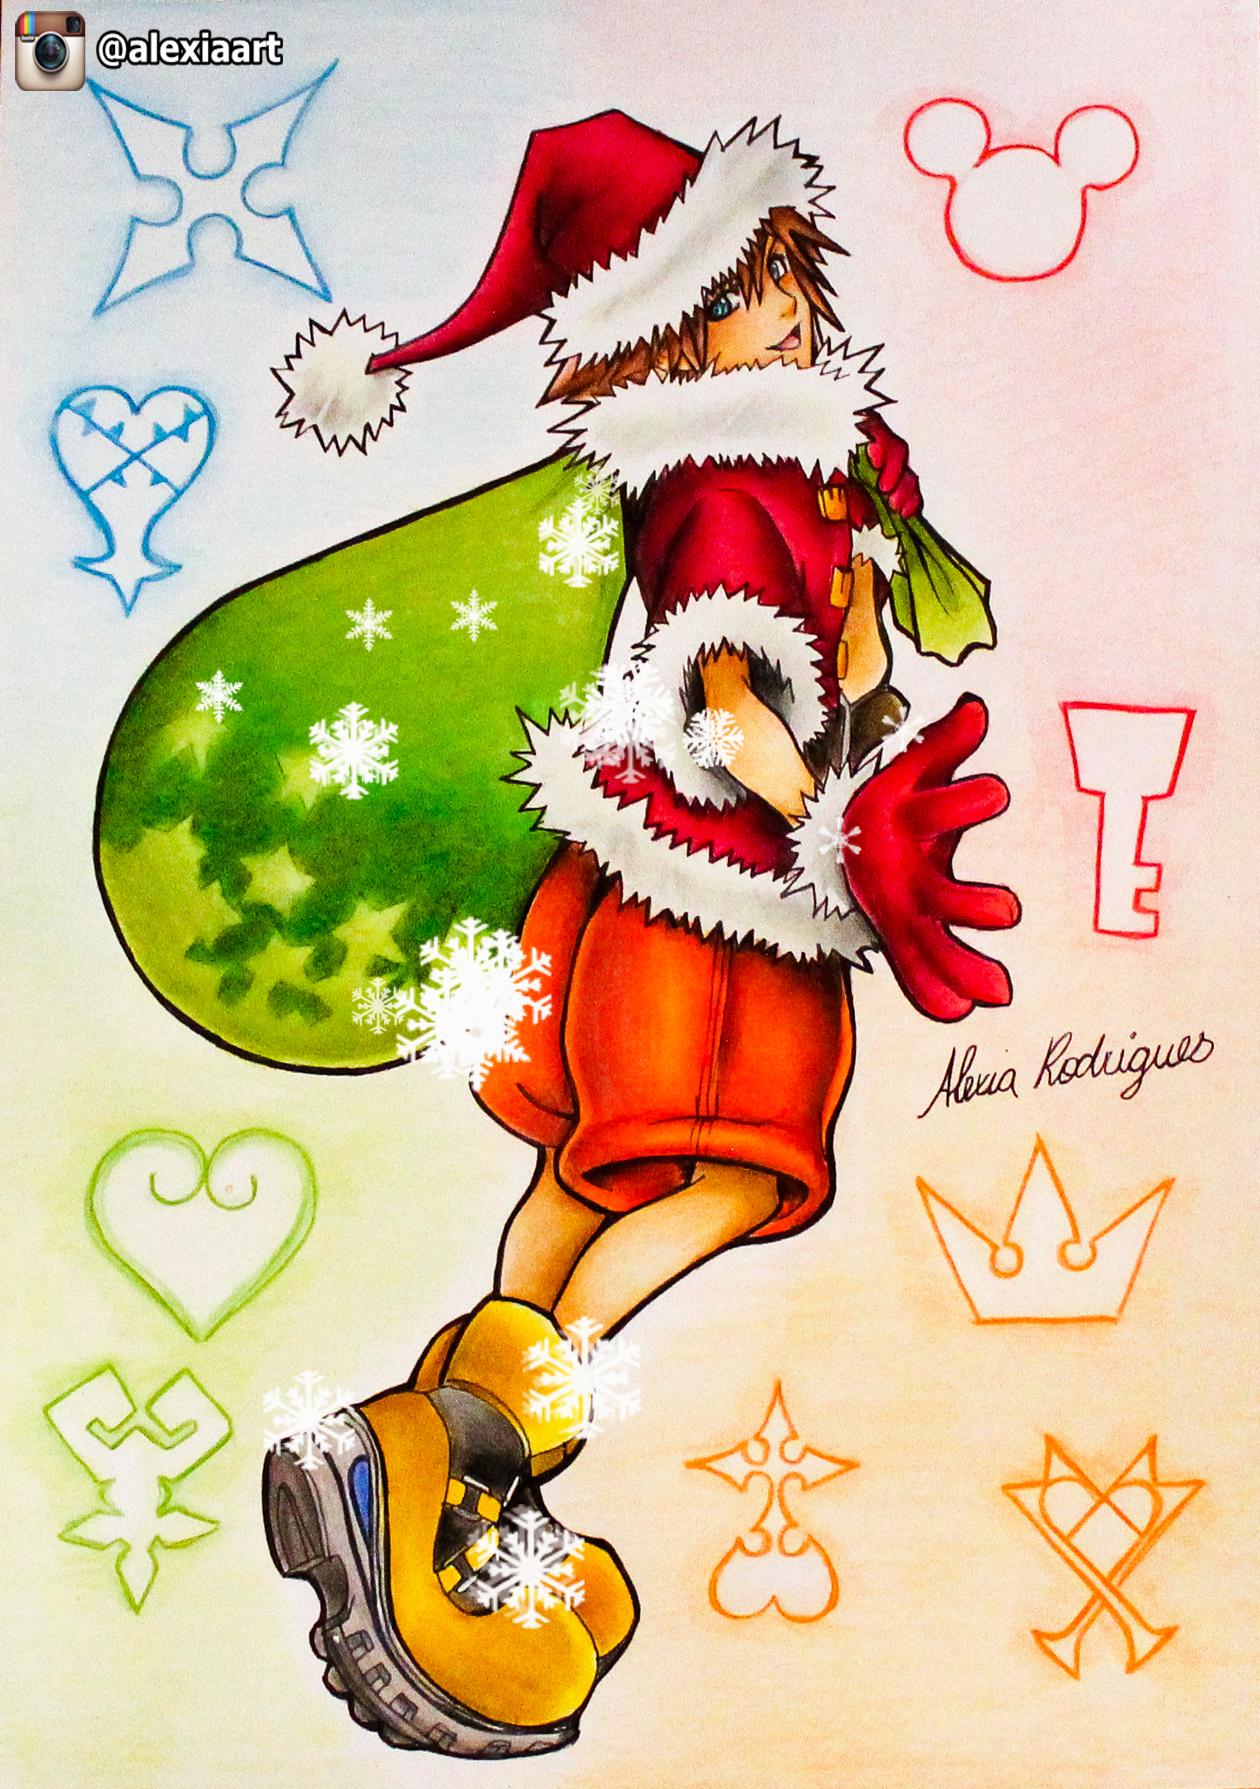 sora kingdom hearts christmas theme by alexiarodrigues on deviantart